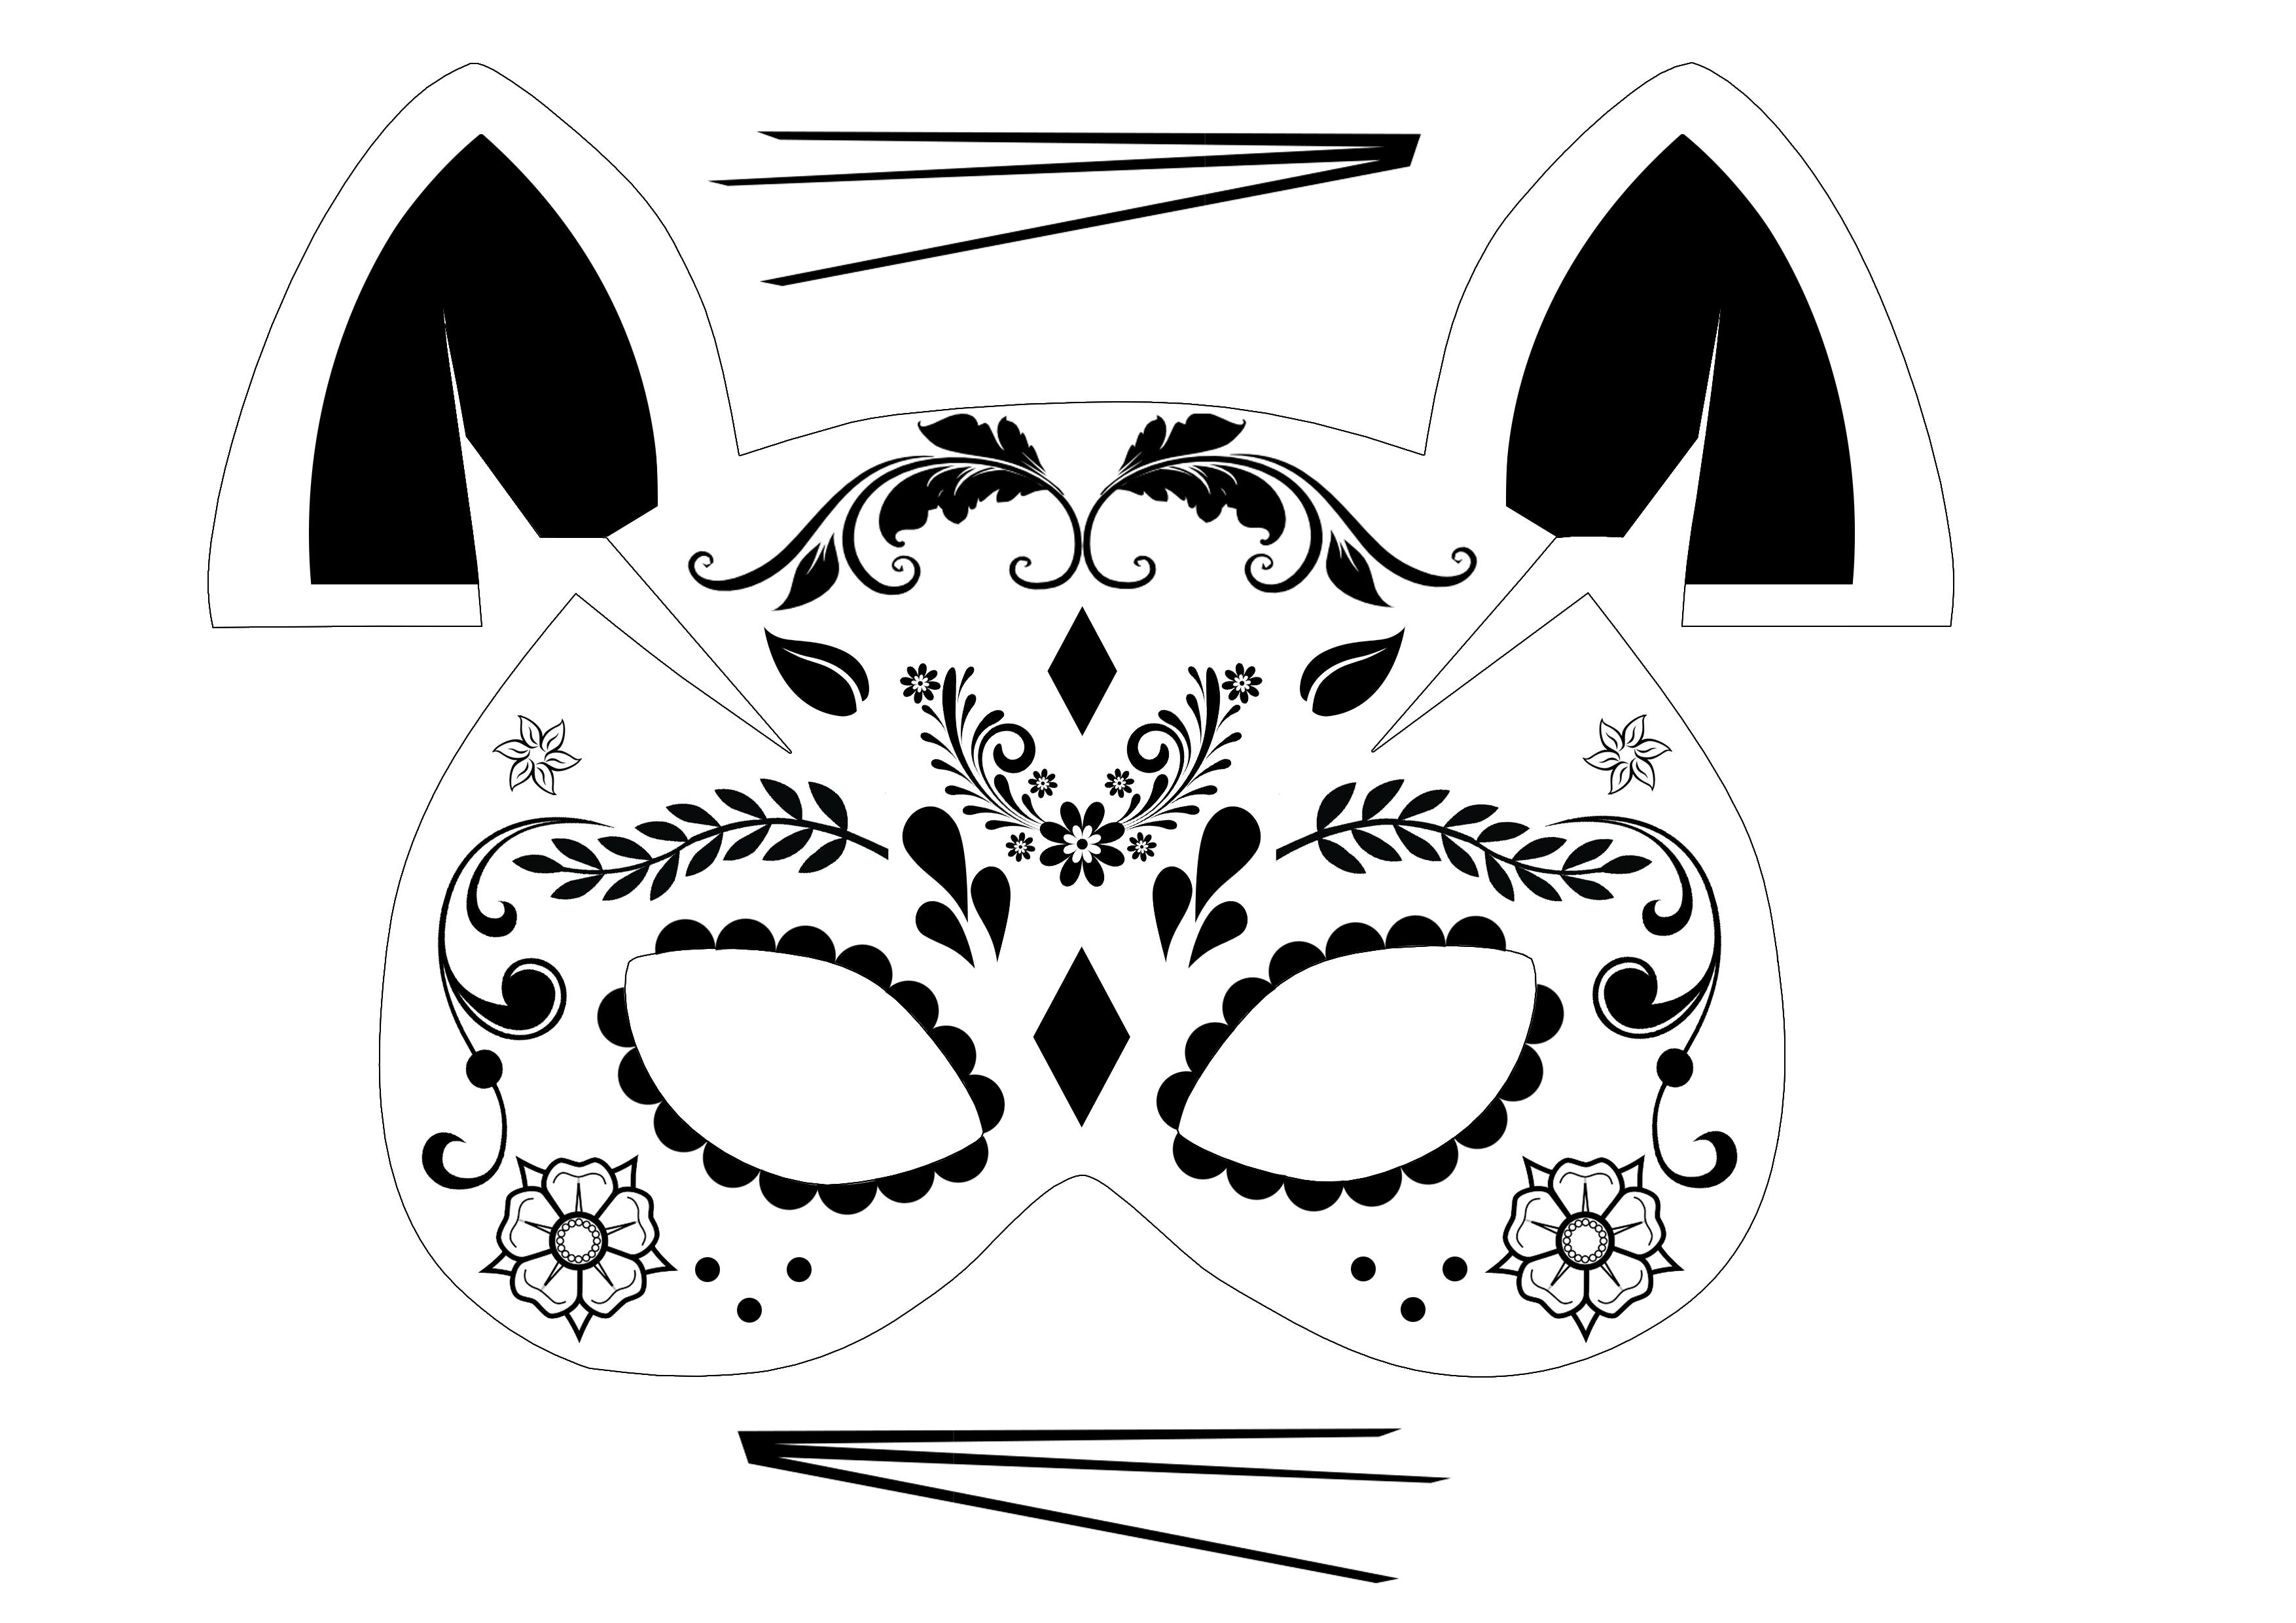 un masque chat pour halloween rose caramelle carnet d 39 inspiration. Black Bedroom Furniture Sets. Home Design Ideas